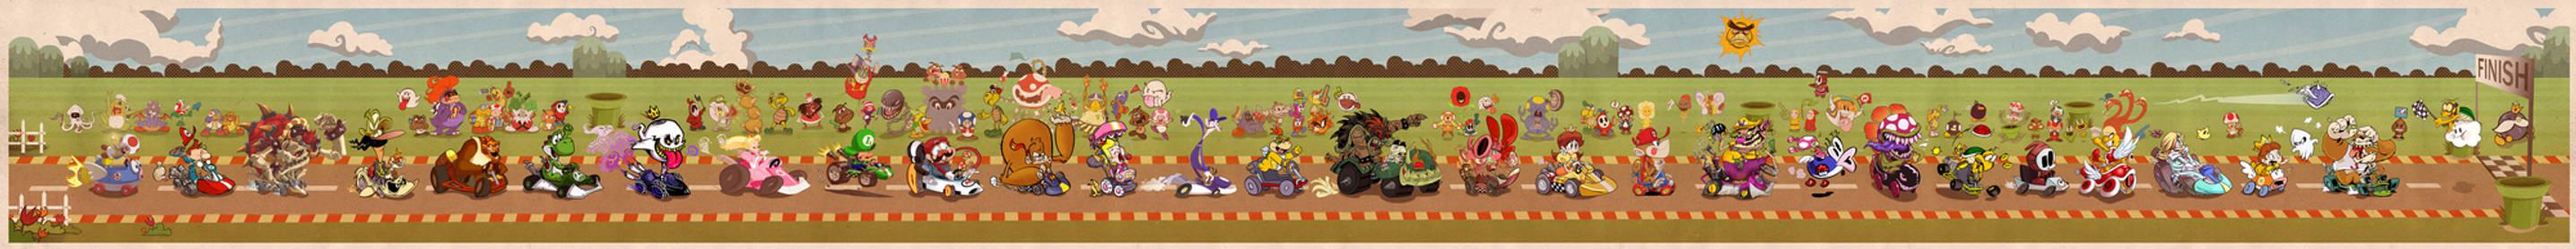 The Mario Kart Collab v.0.1